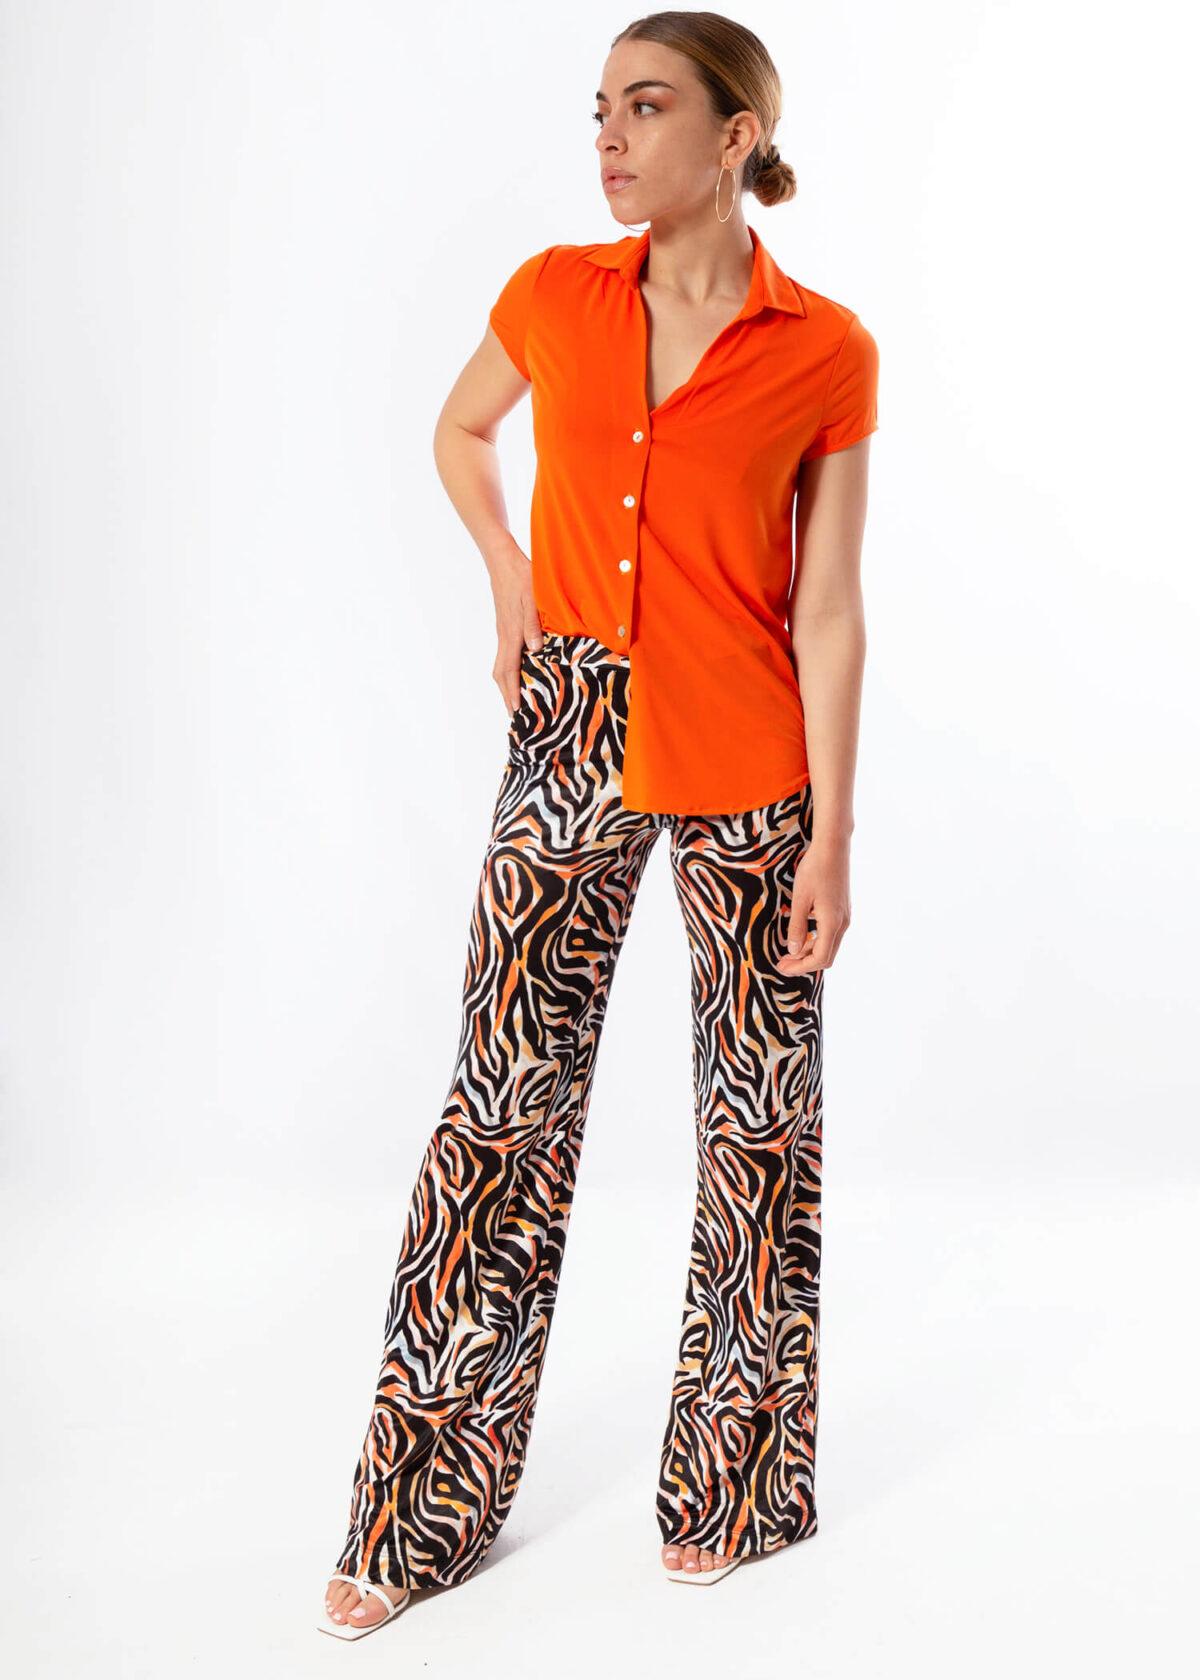 pantalon-pijama-parole-italy-zebra-multicolor-lopezientos